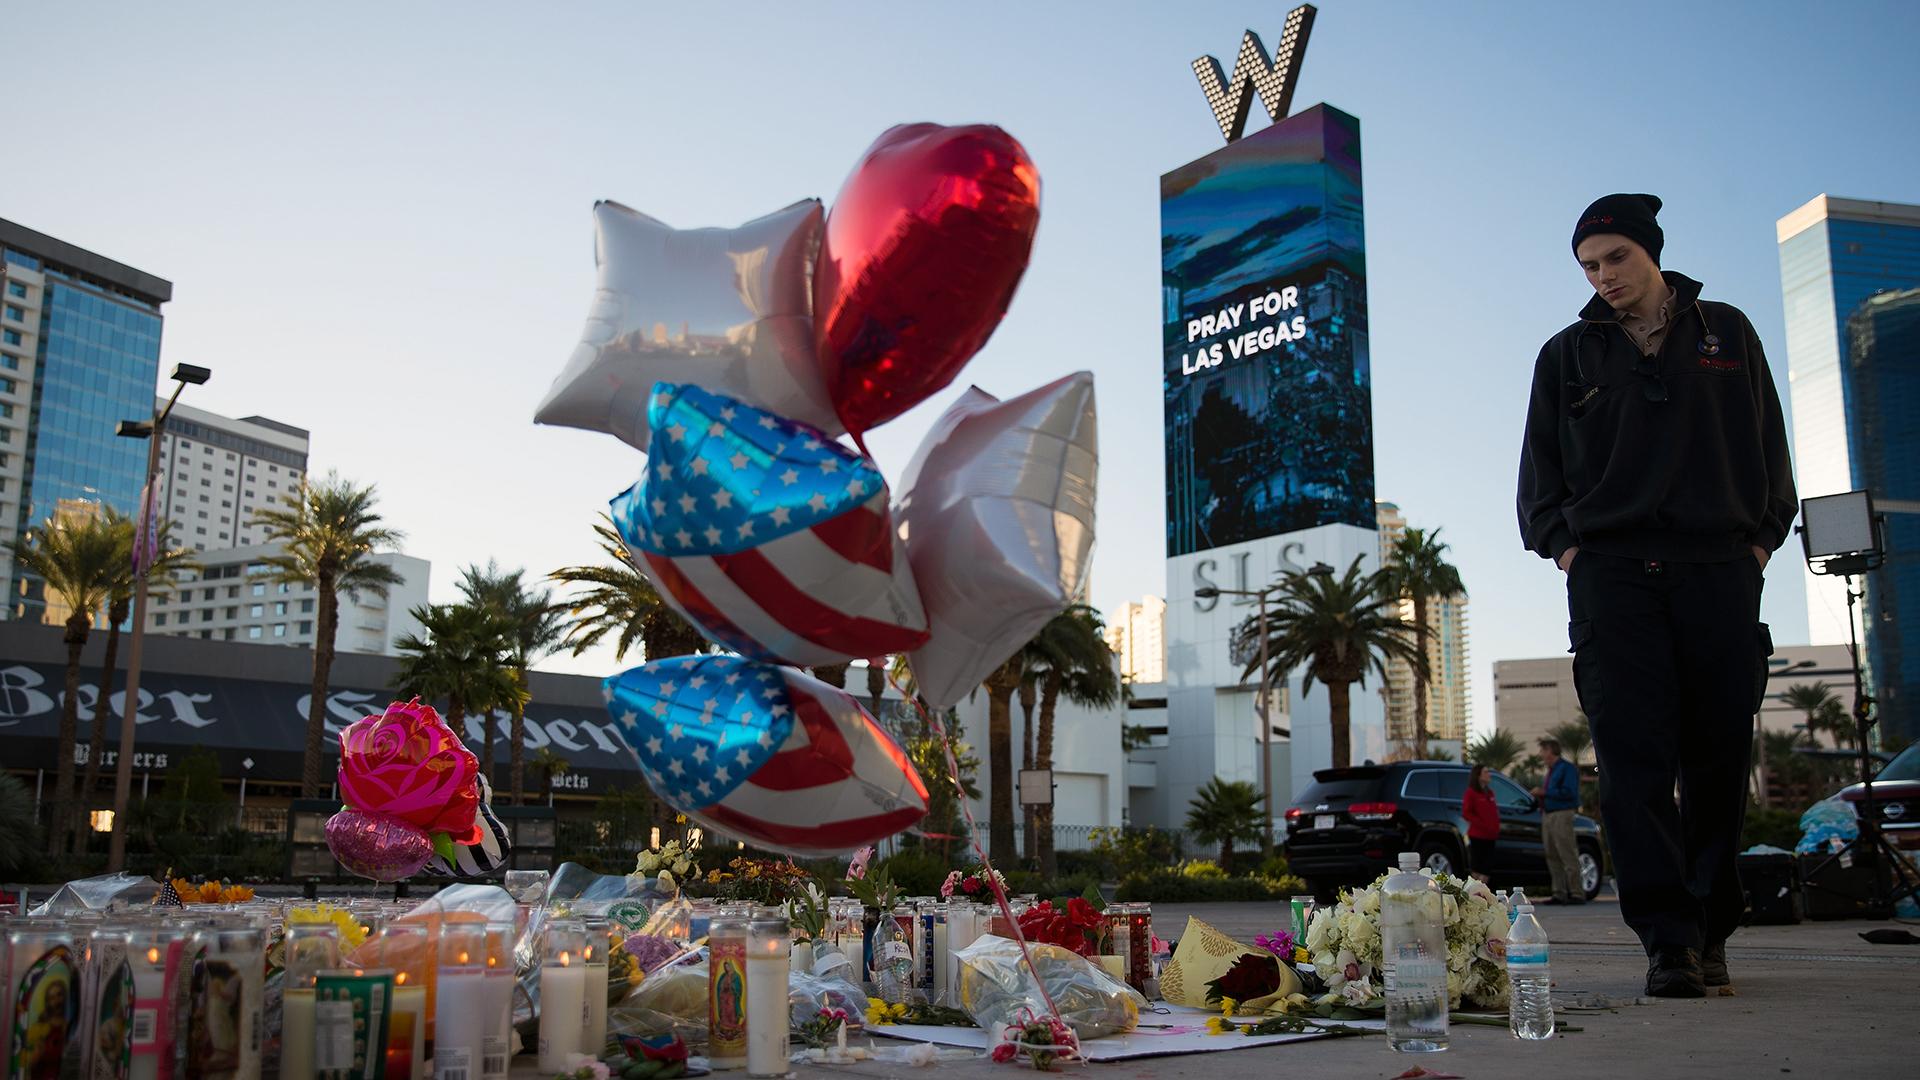 Las Vegas Mass Shooting memorial by W Hotel-159532.jpg84553958